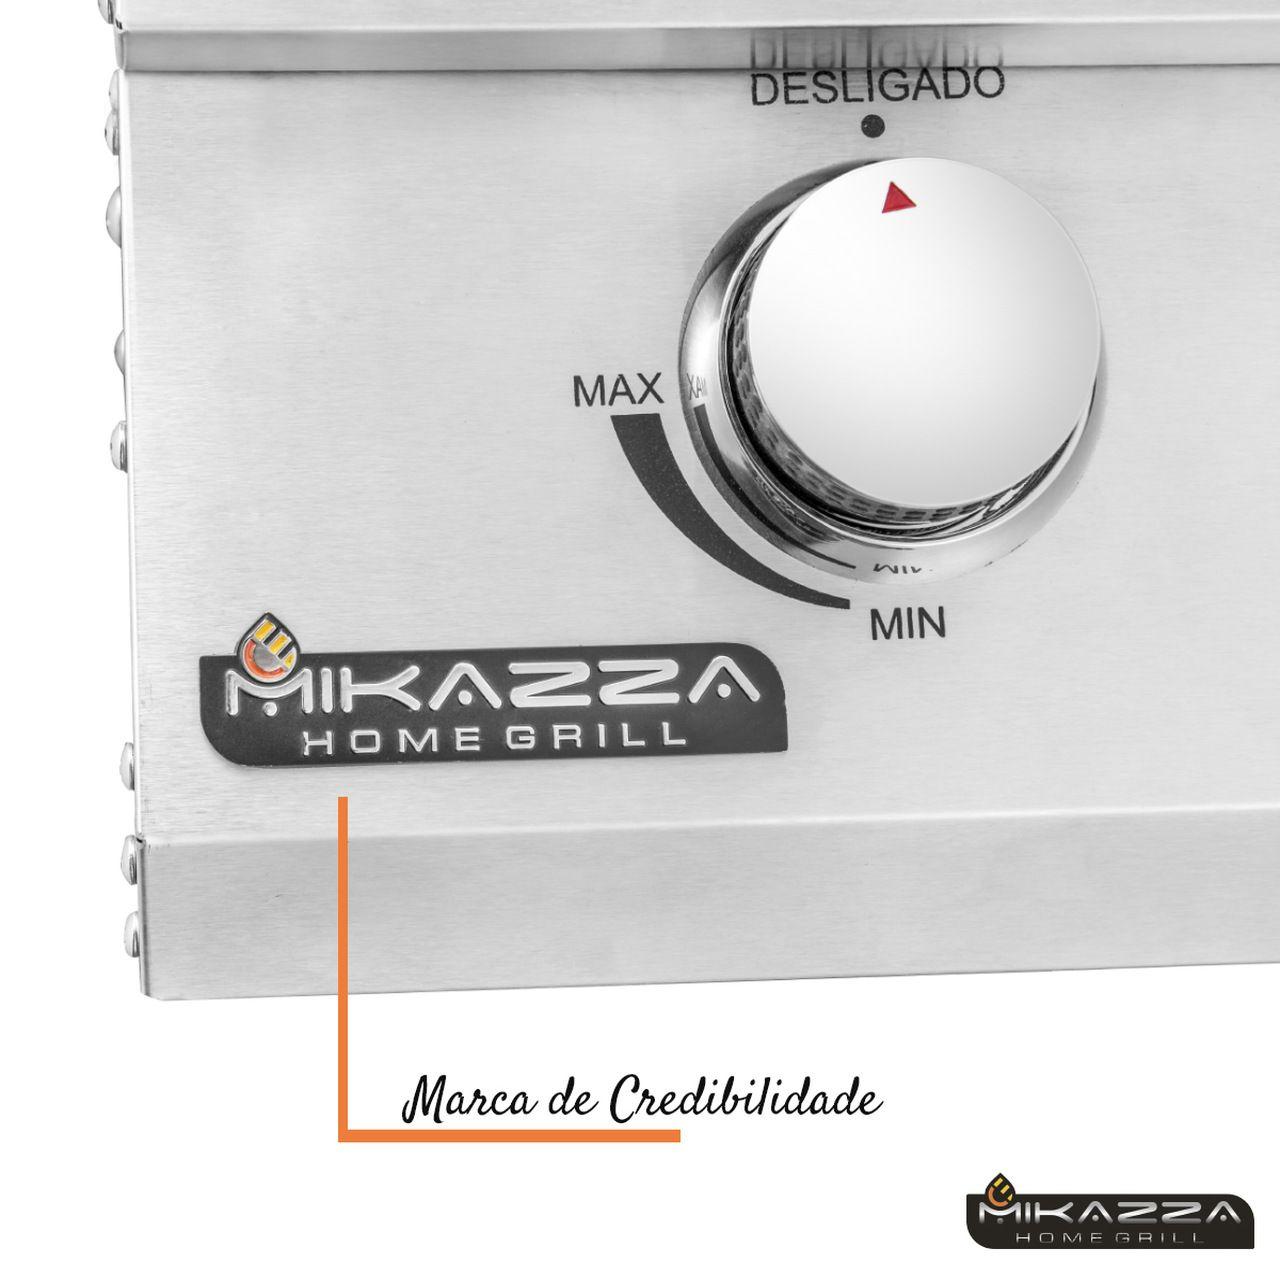 Churrasqueira à Gás Embutir Mikazza Pro 5 Combo + Capa Protetora